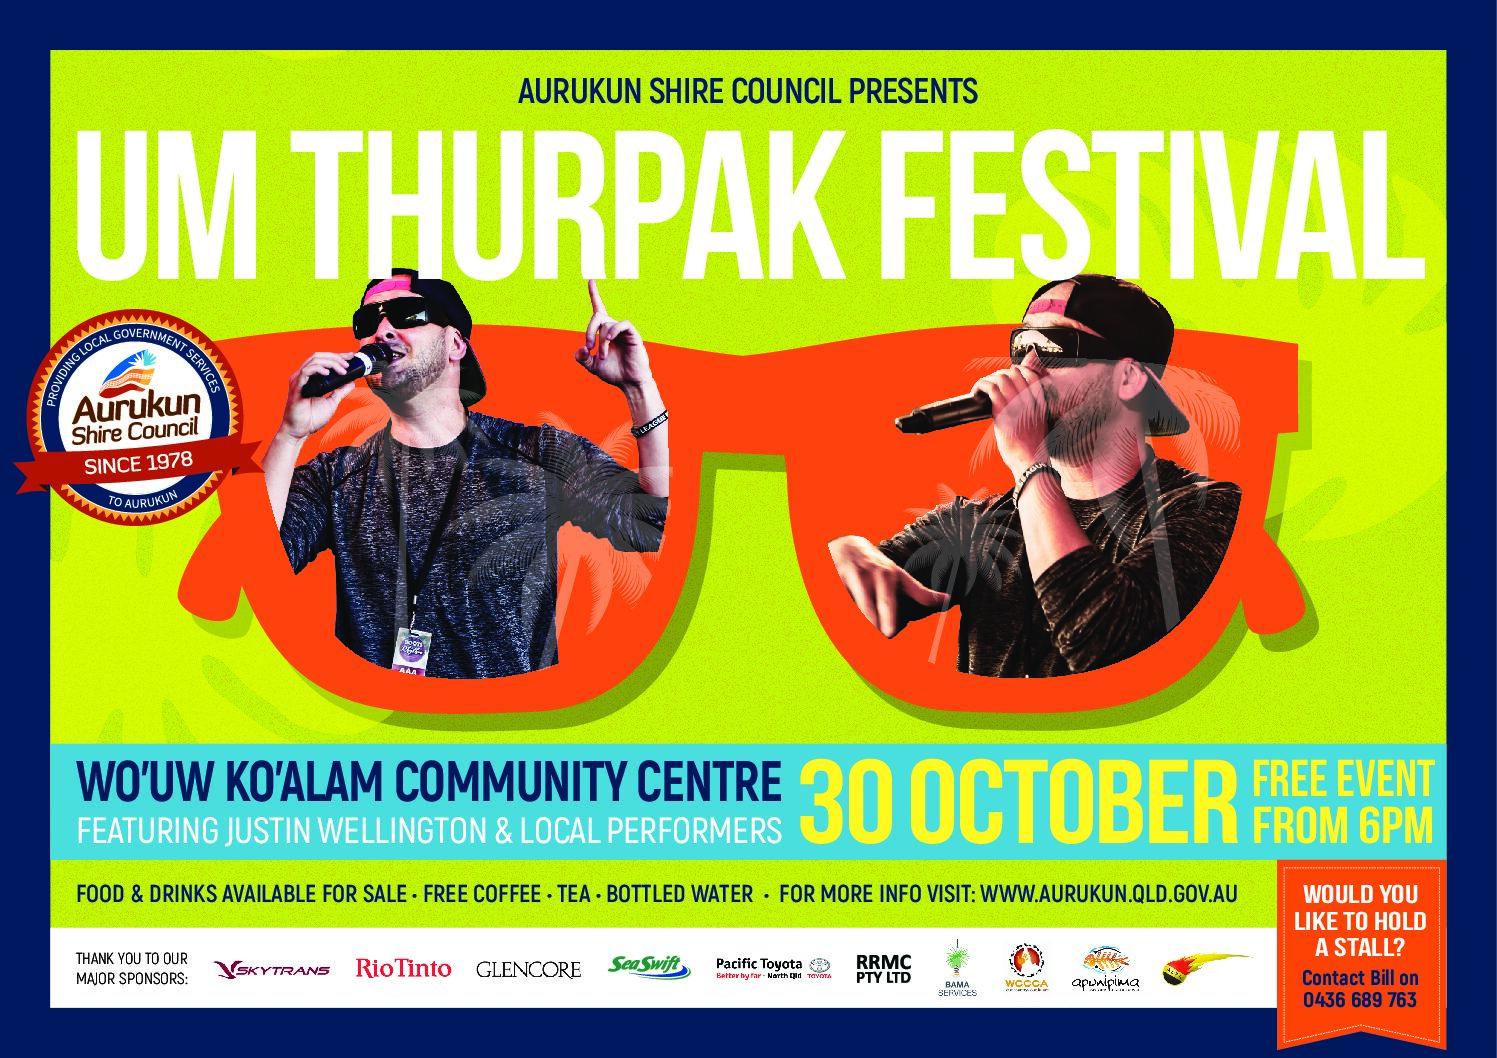 Um Thurpak Concert with Justin Wellington